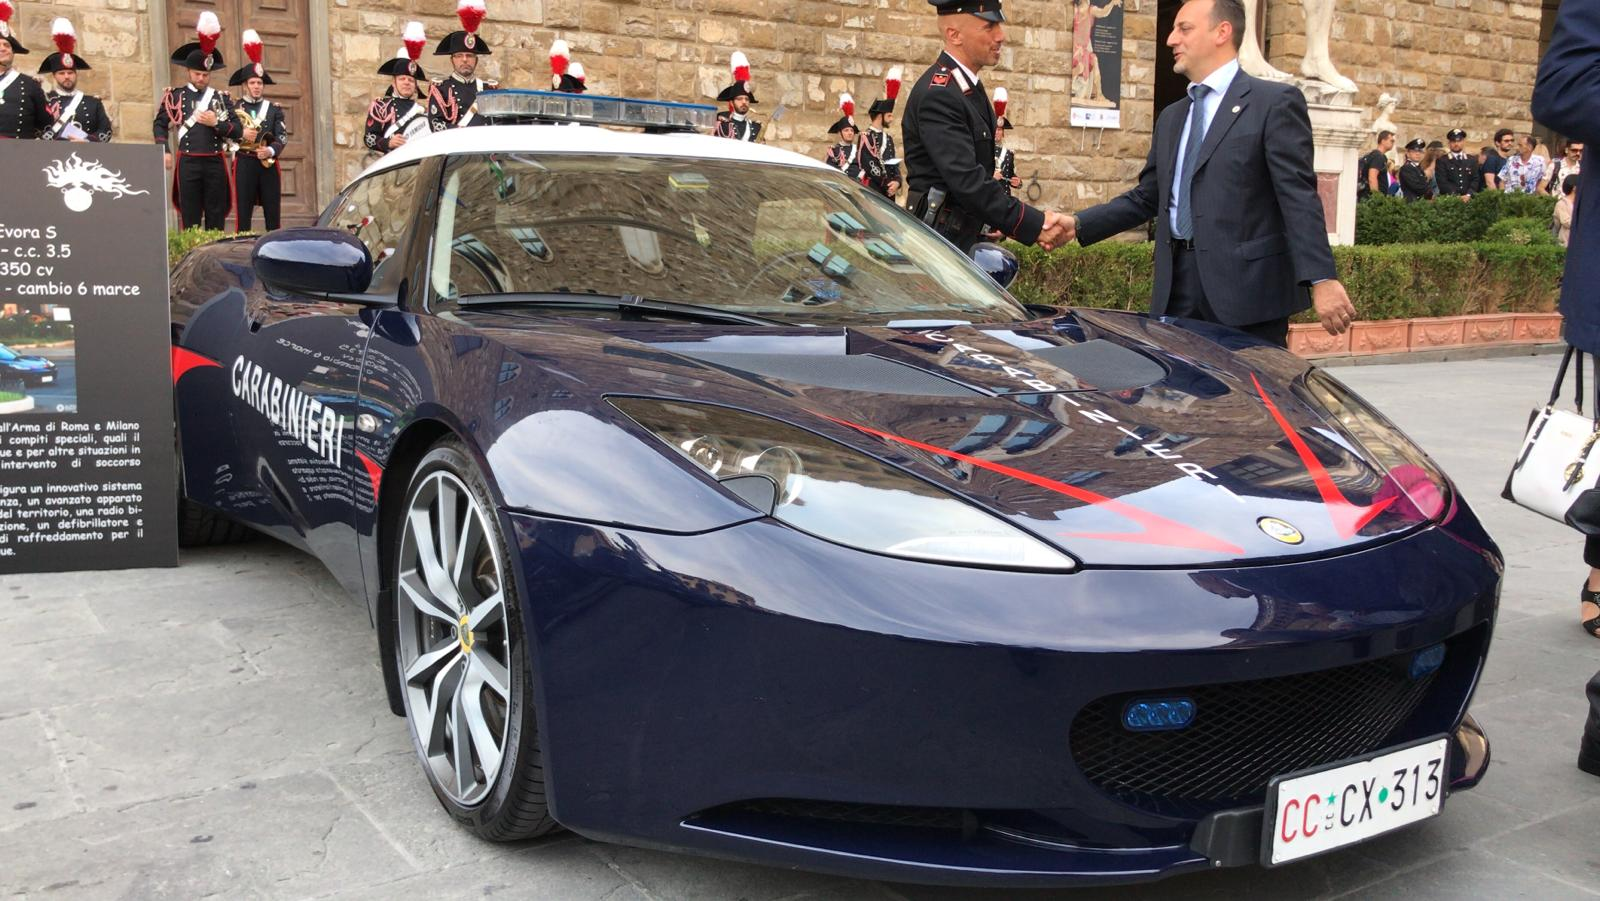 160esimo Carabinieri